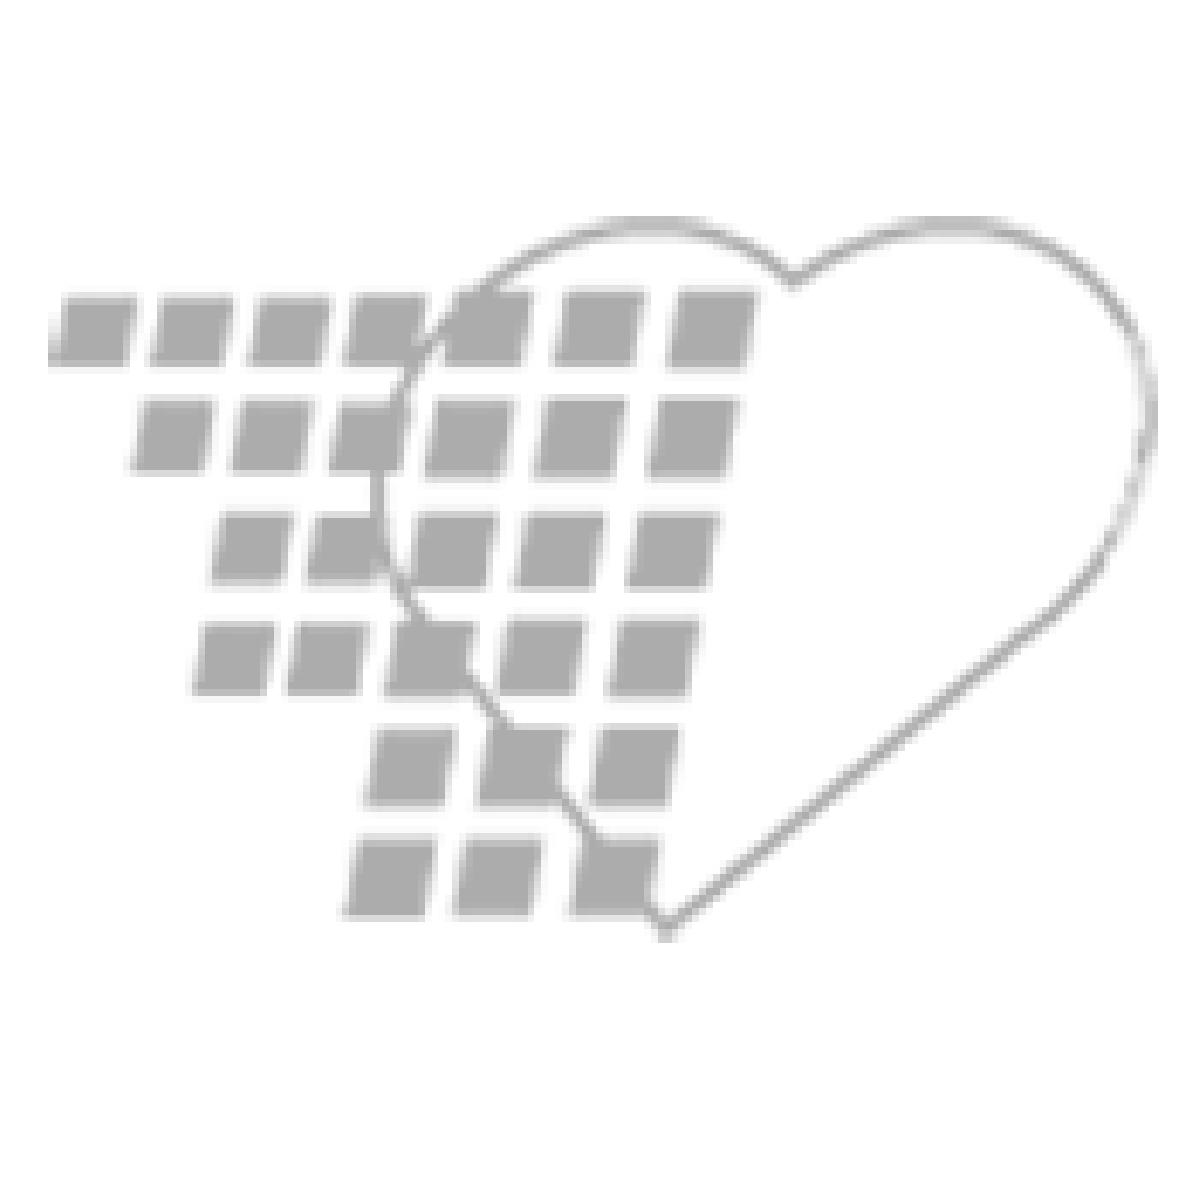 06-93-2025 - Demo Dose® Lispr Insuln 100 units mL 10 mL